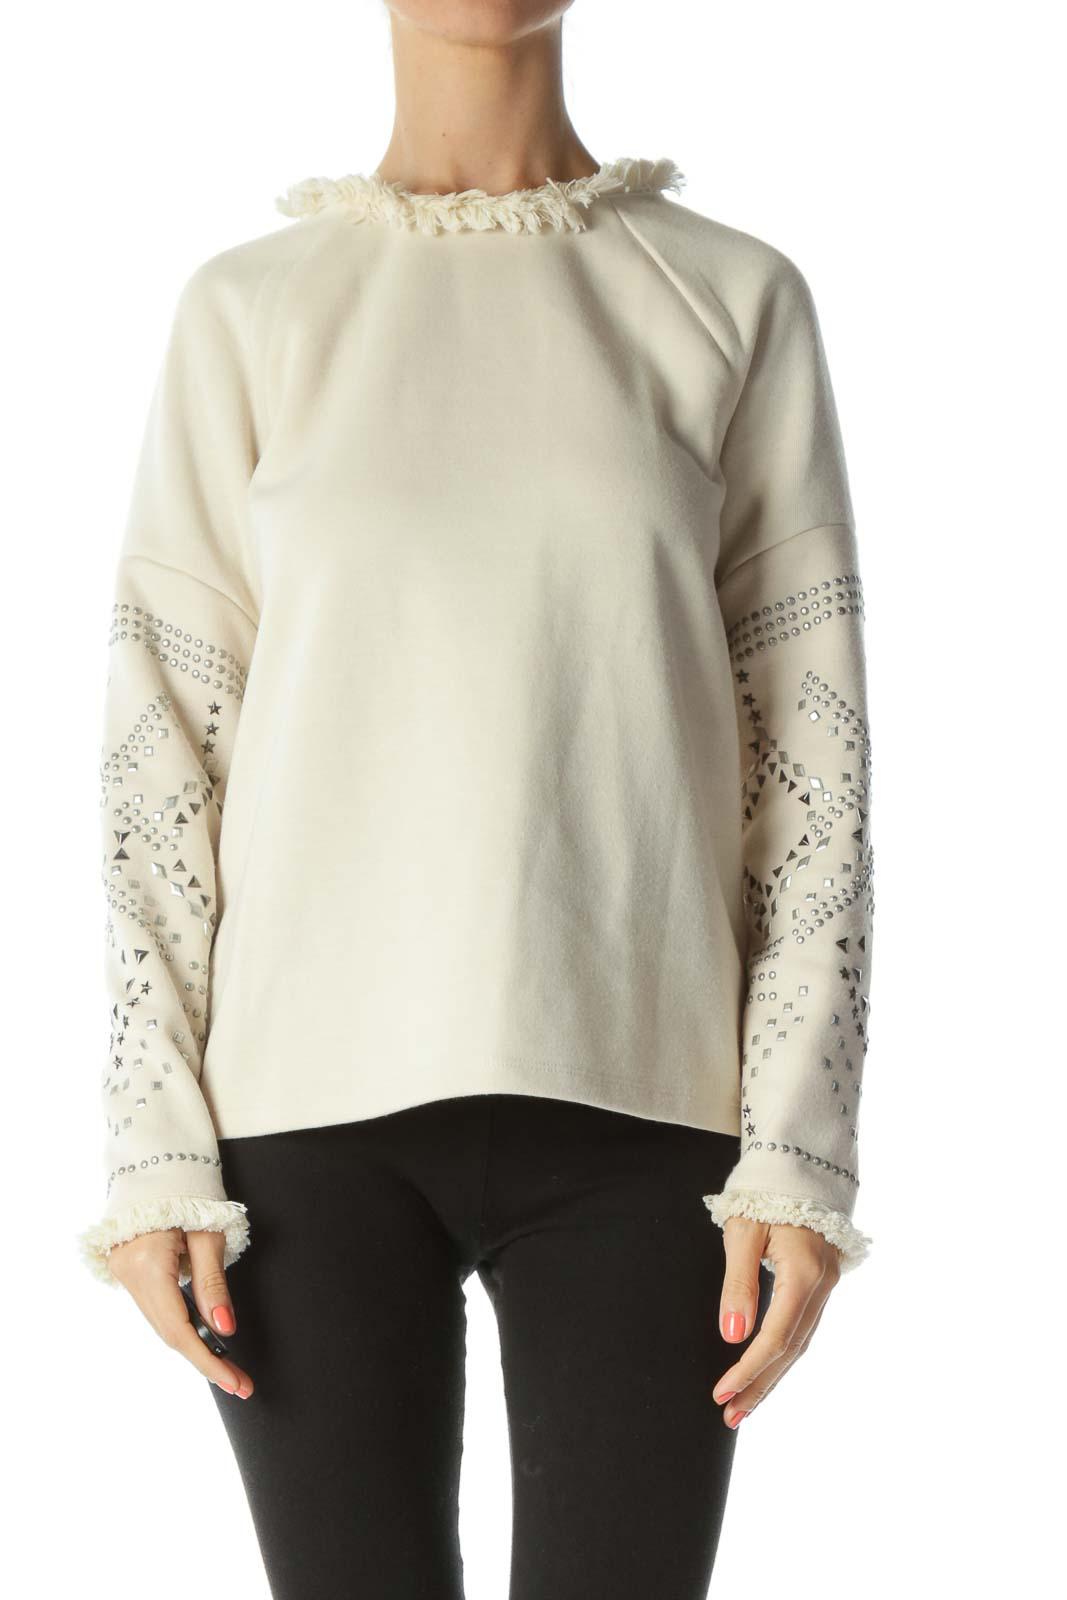 Cream Fringed-Neckline Bejewel-Sleeved Long-Sleeve Sweater Front